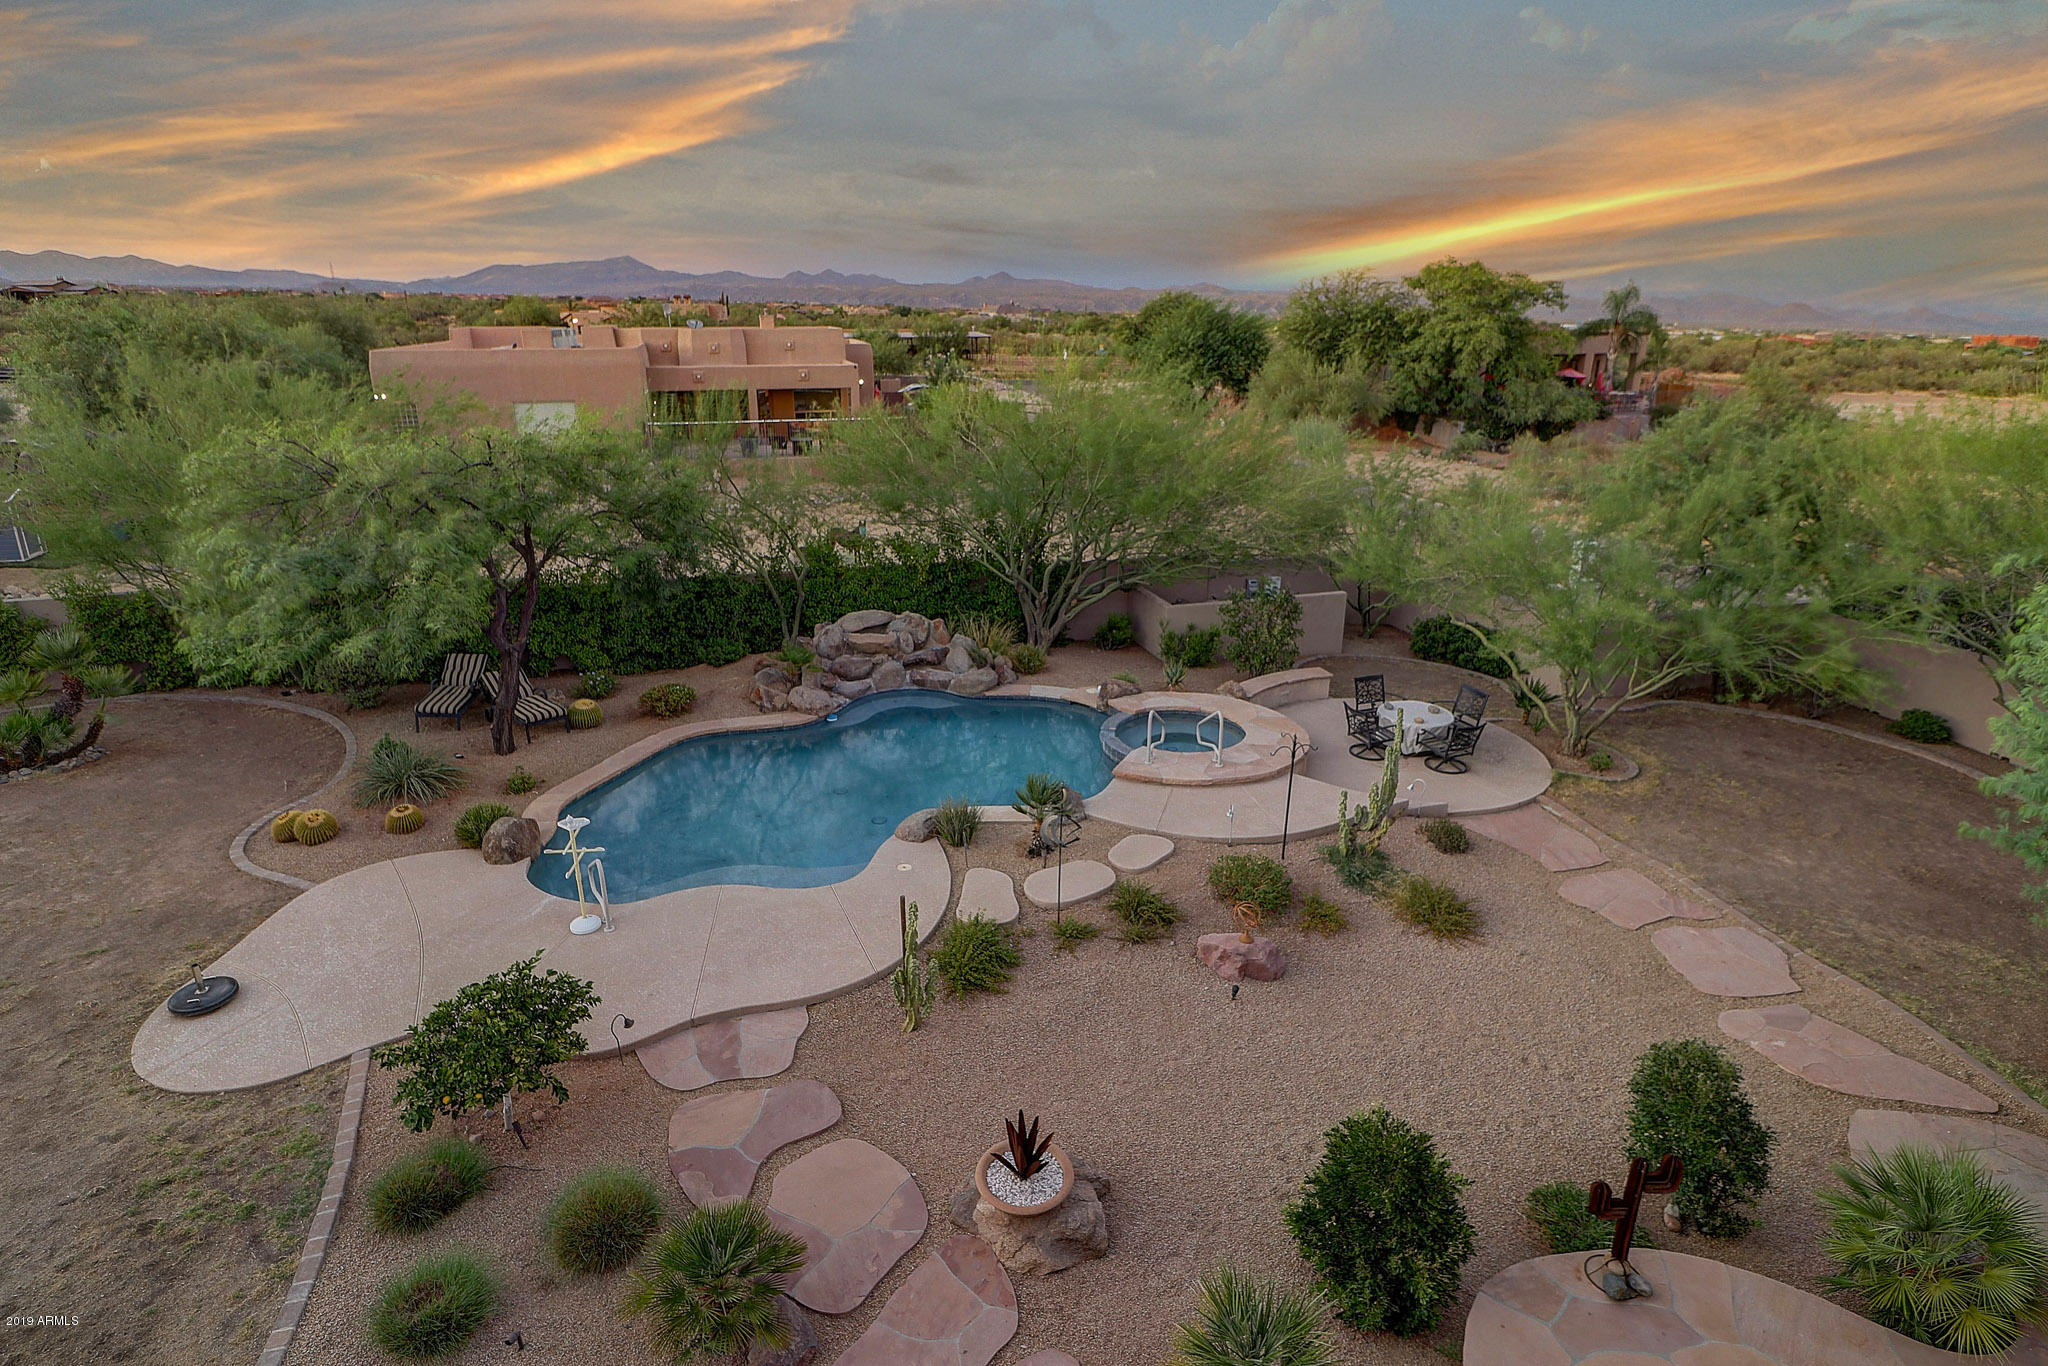 MLS 5972190 29620 N 142ND Place, Scottsdale, AZ 85262 Scottsdale AZ Private Pool